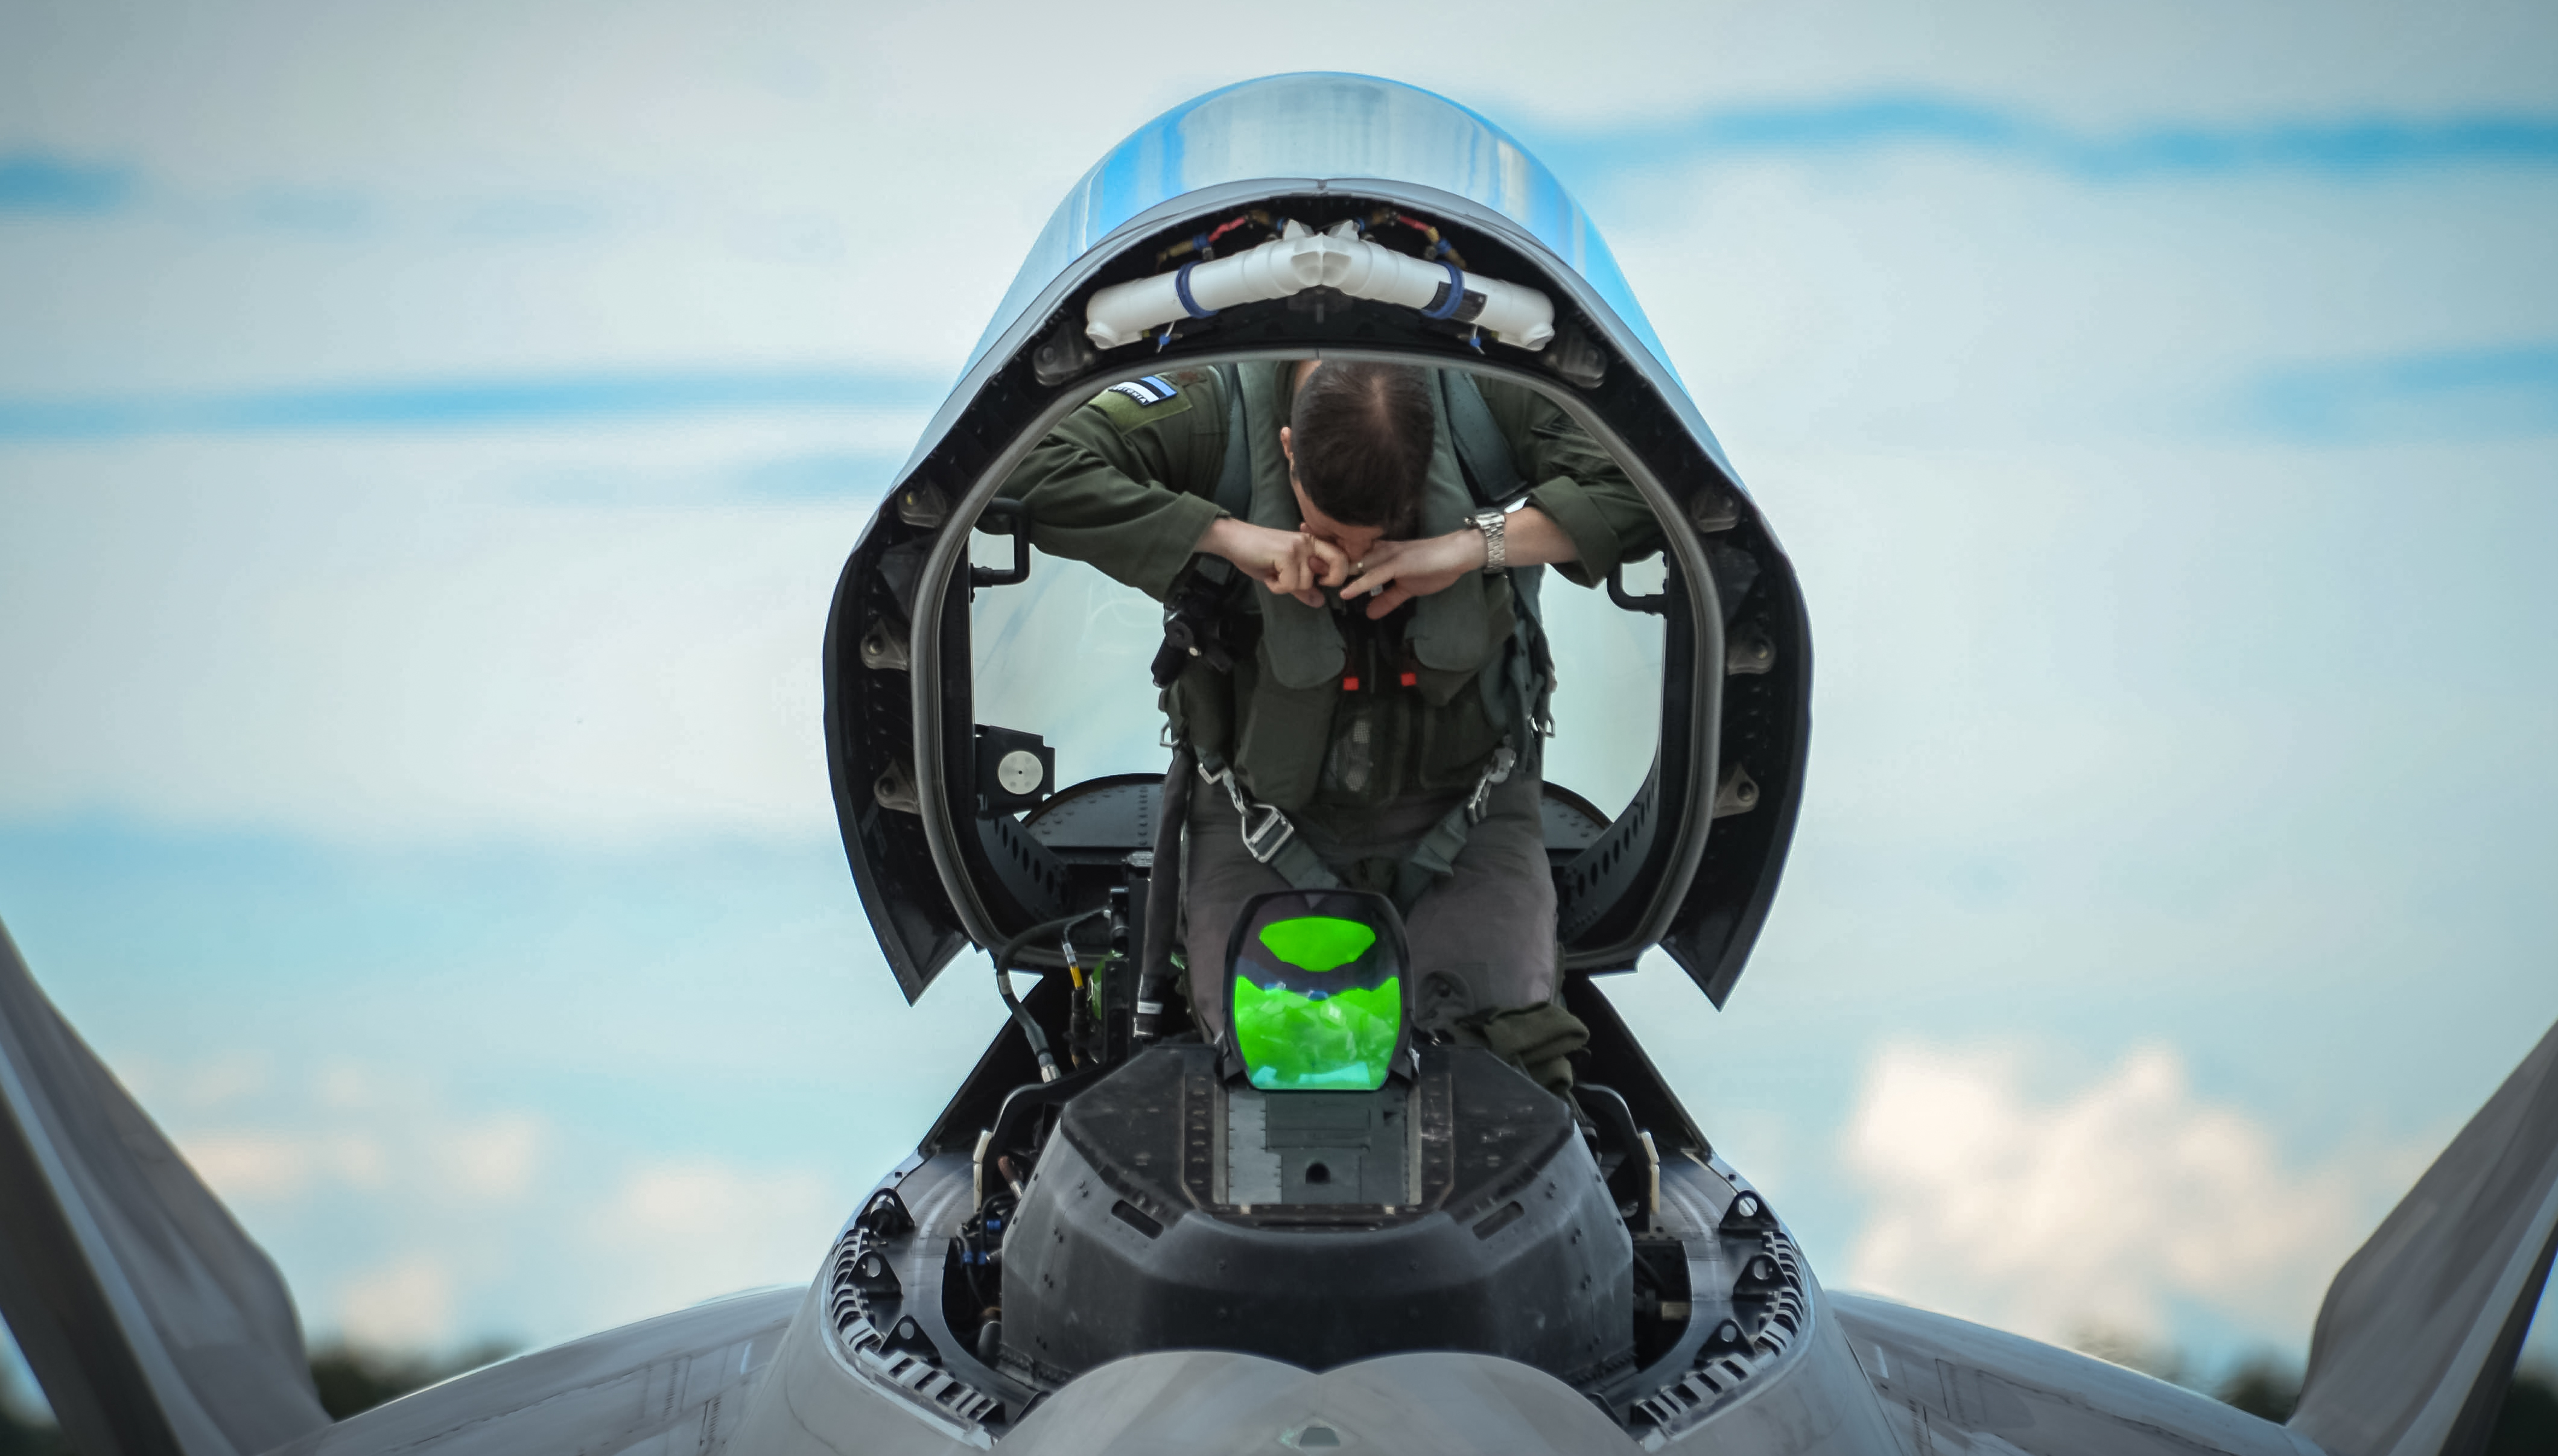 File:F-22 Raptor at Ämari Air Base, Estonia, Sept. 4, 2015 ... Usaf Fighter Pilot F 22